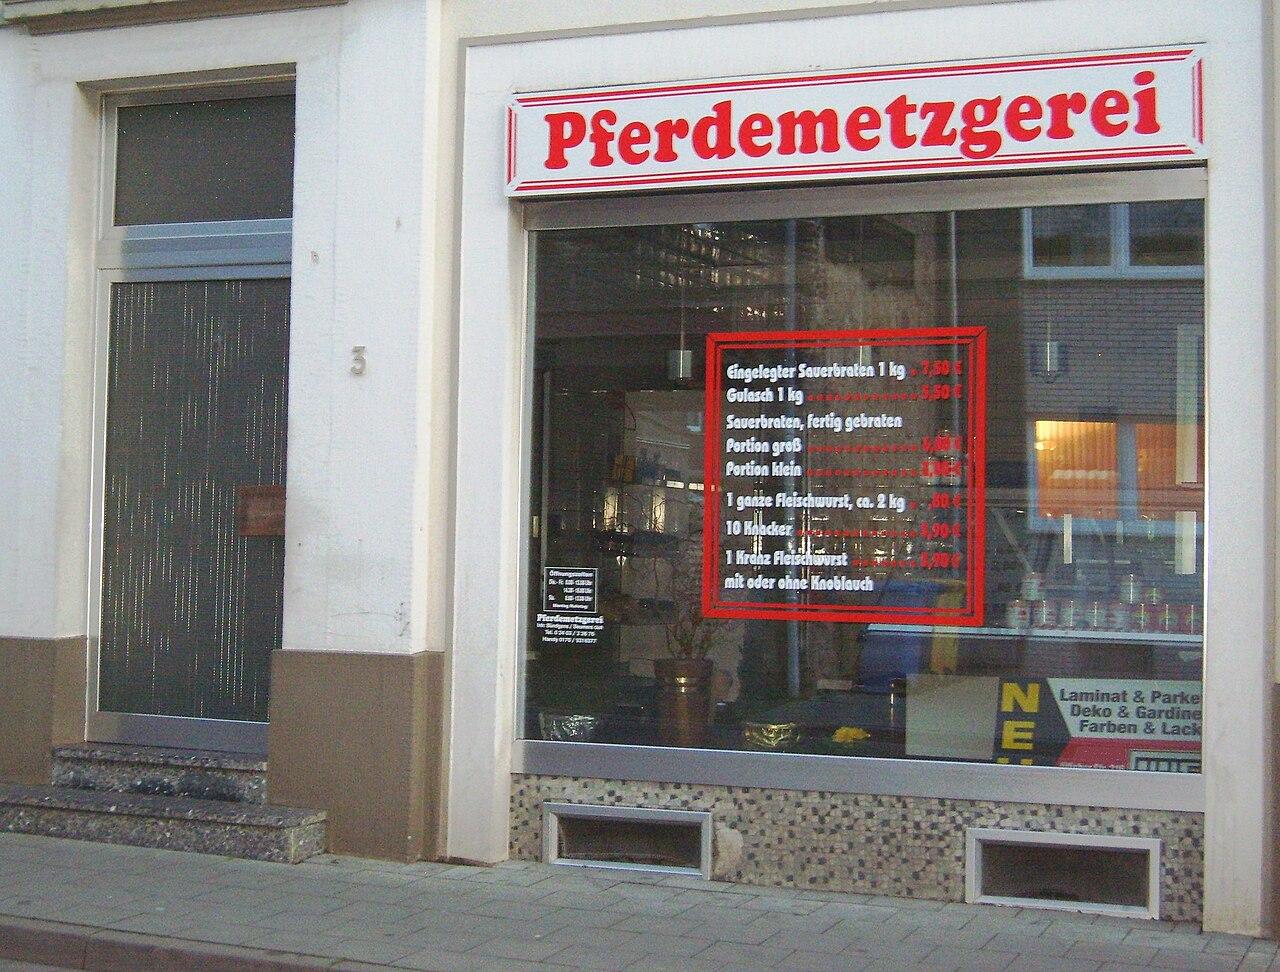 Pferdemetzger Eschweiler